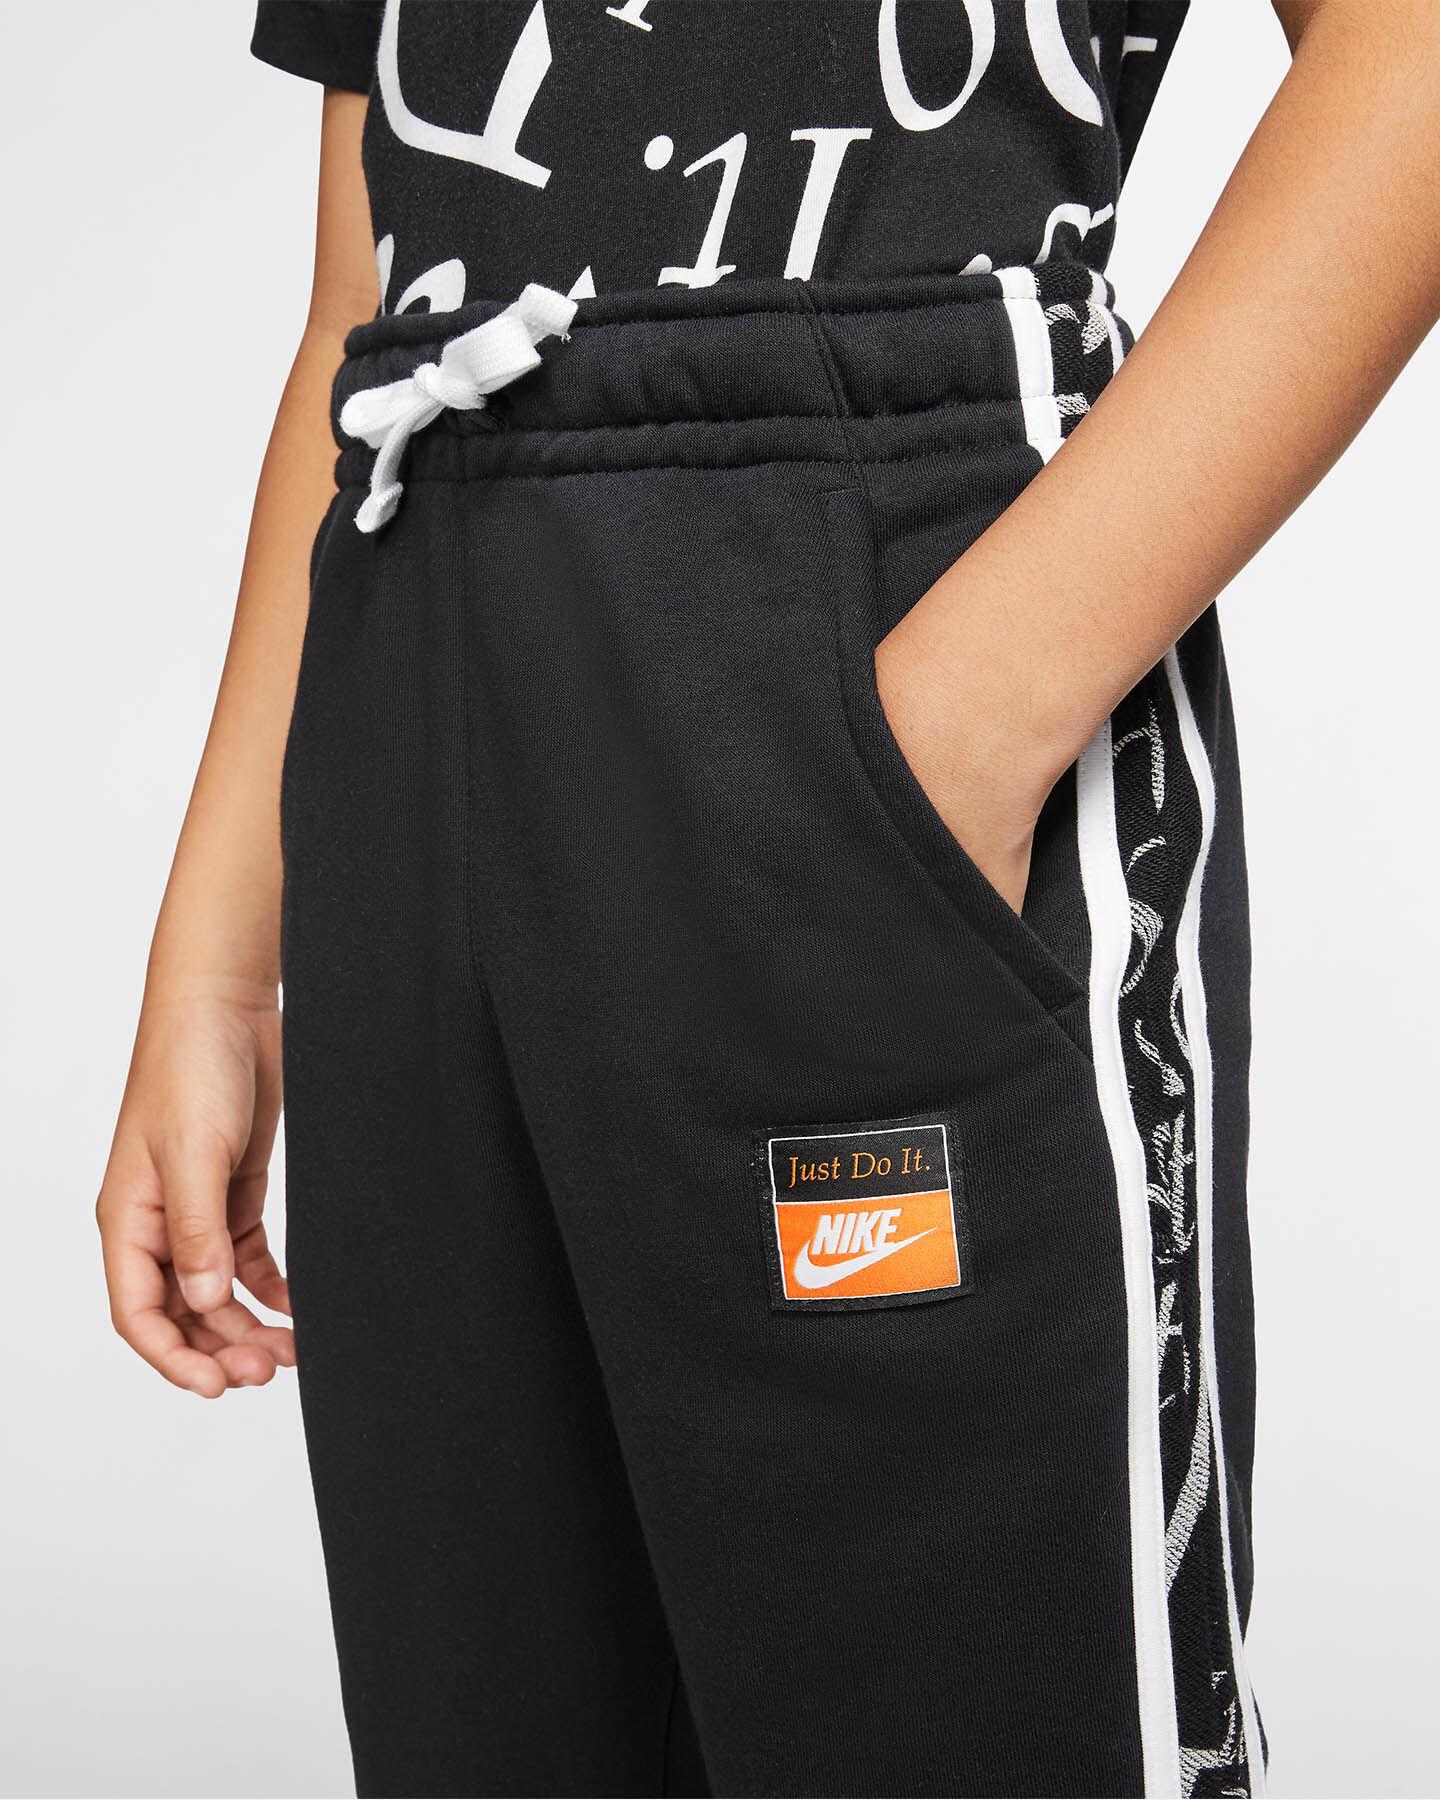 Pantalone NIKE LETTER JR S5164571 scatto 4